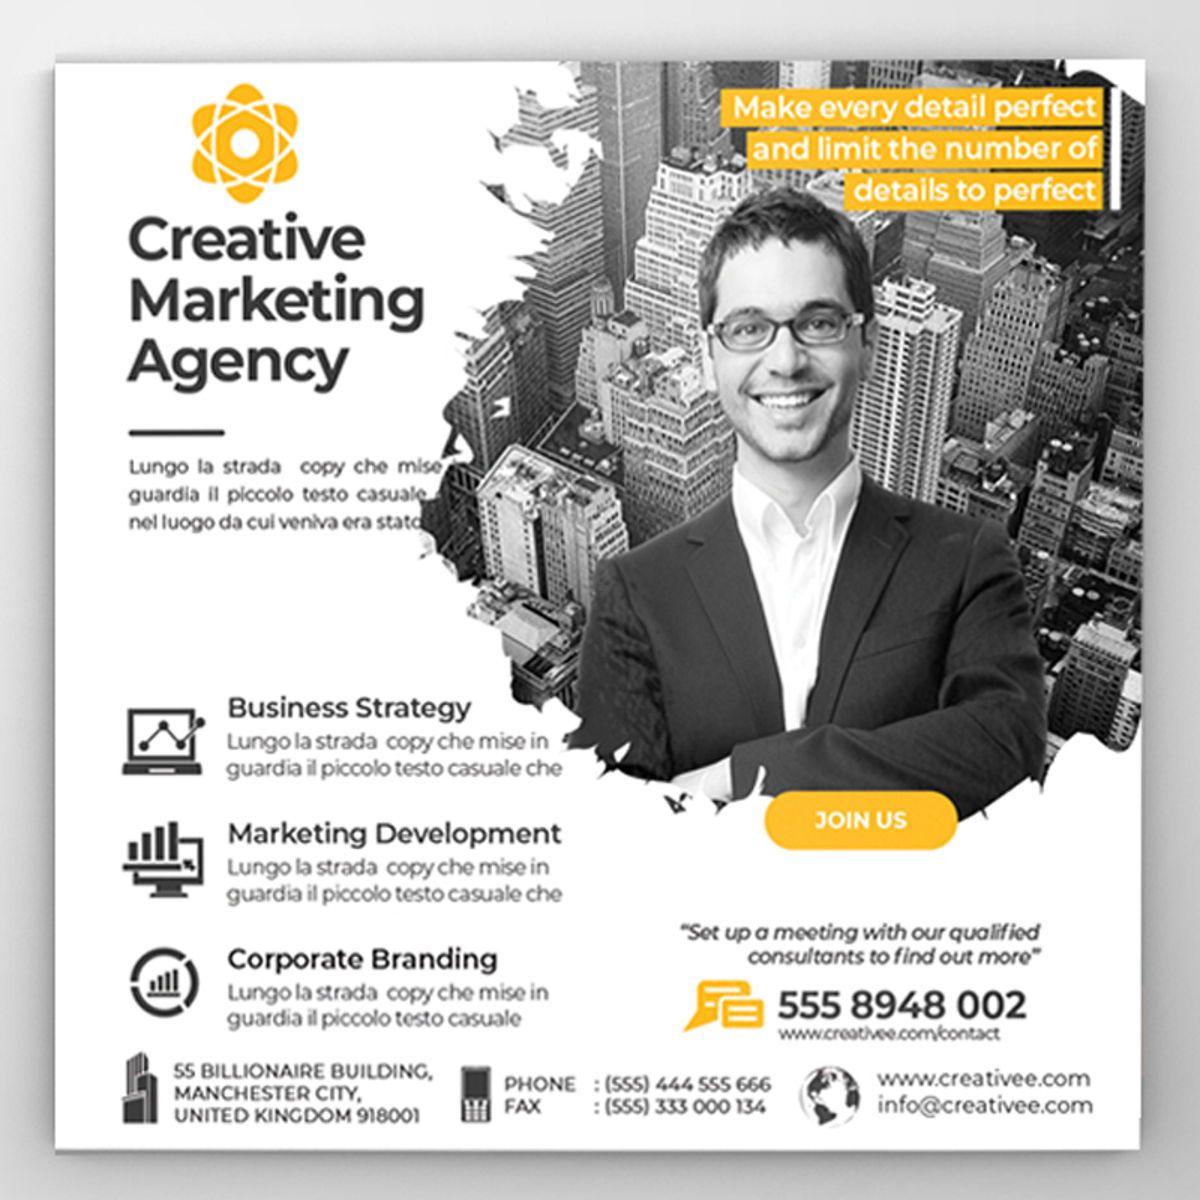 Creative Agency Flyer Template, Diapositive 3, 08521, Business — PoweredTemplate.com